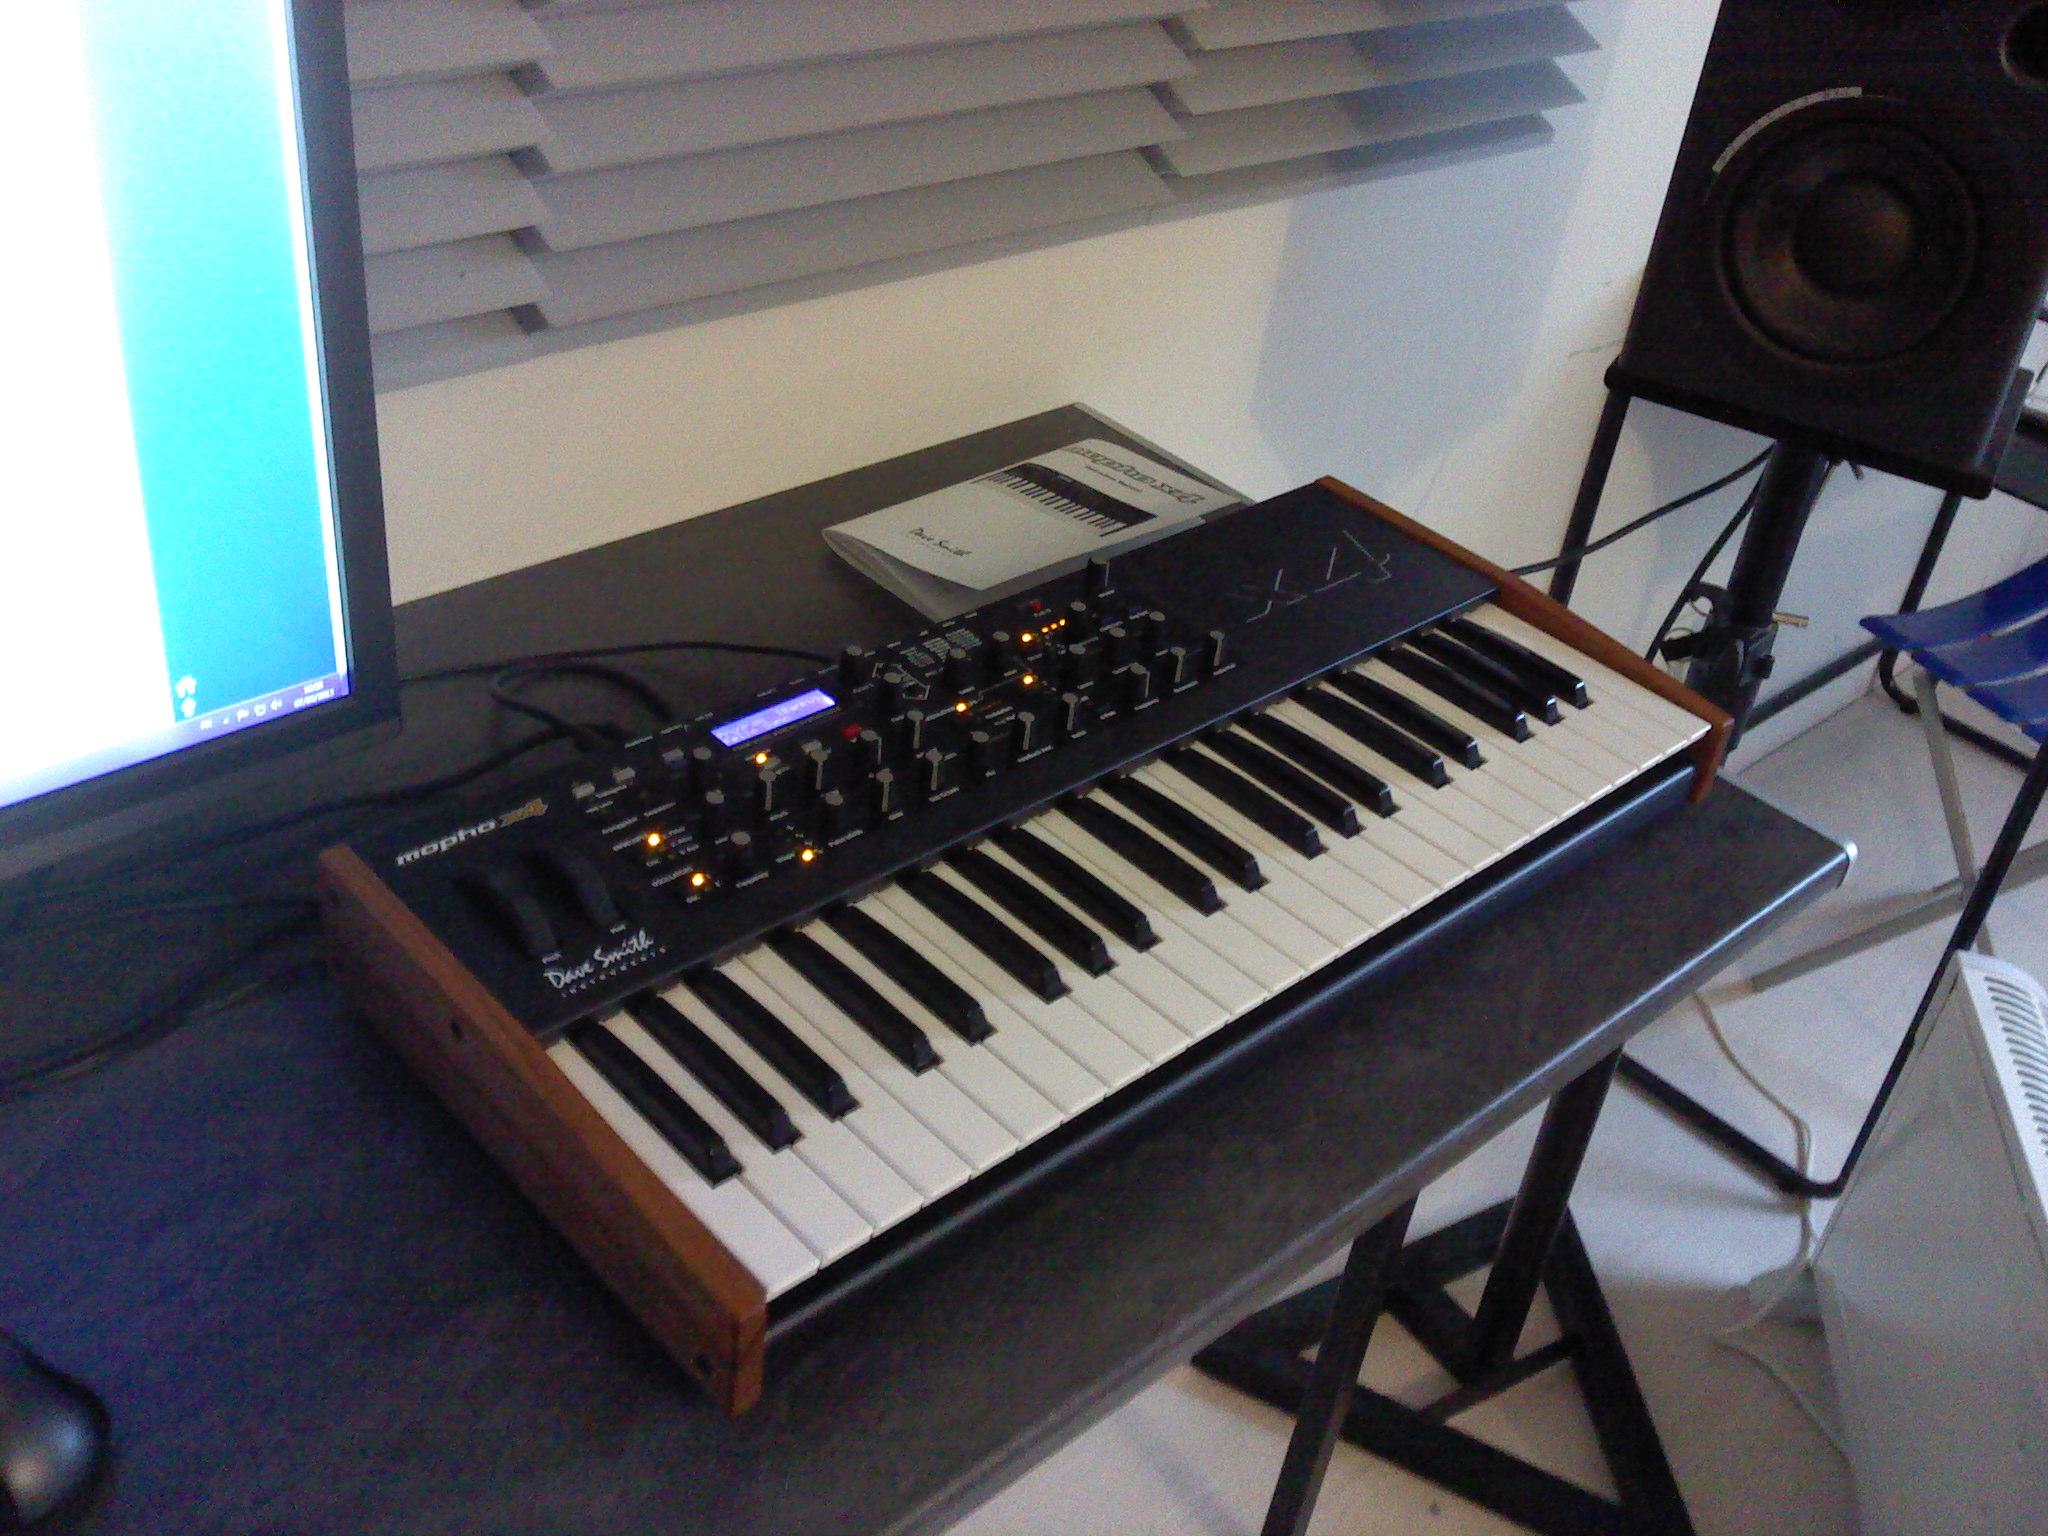 dave smith instruments mopho x4 image 592443 audiofanzine. Black Bedroom Furniture Sets. Home Design Ideas